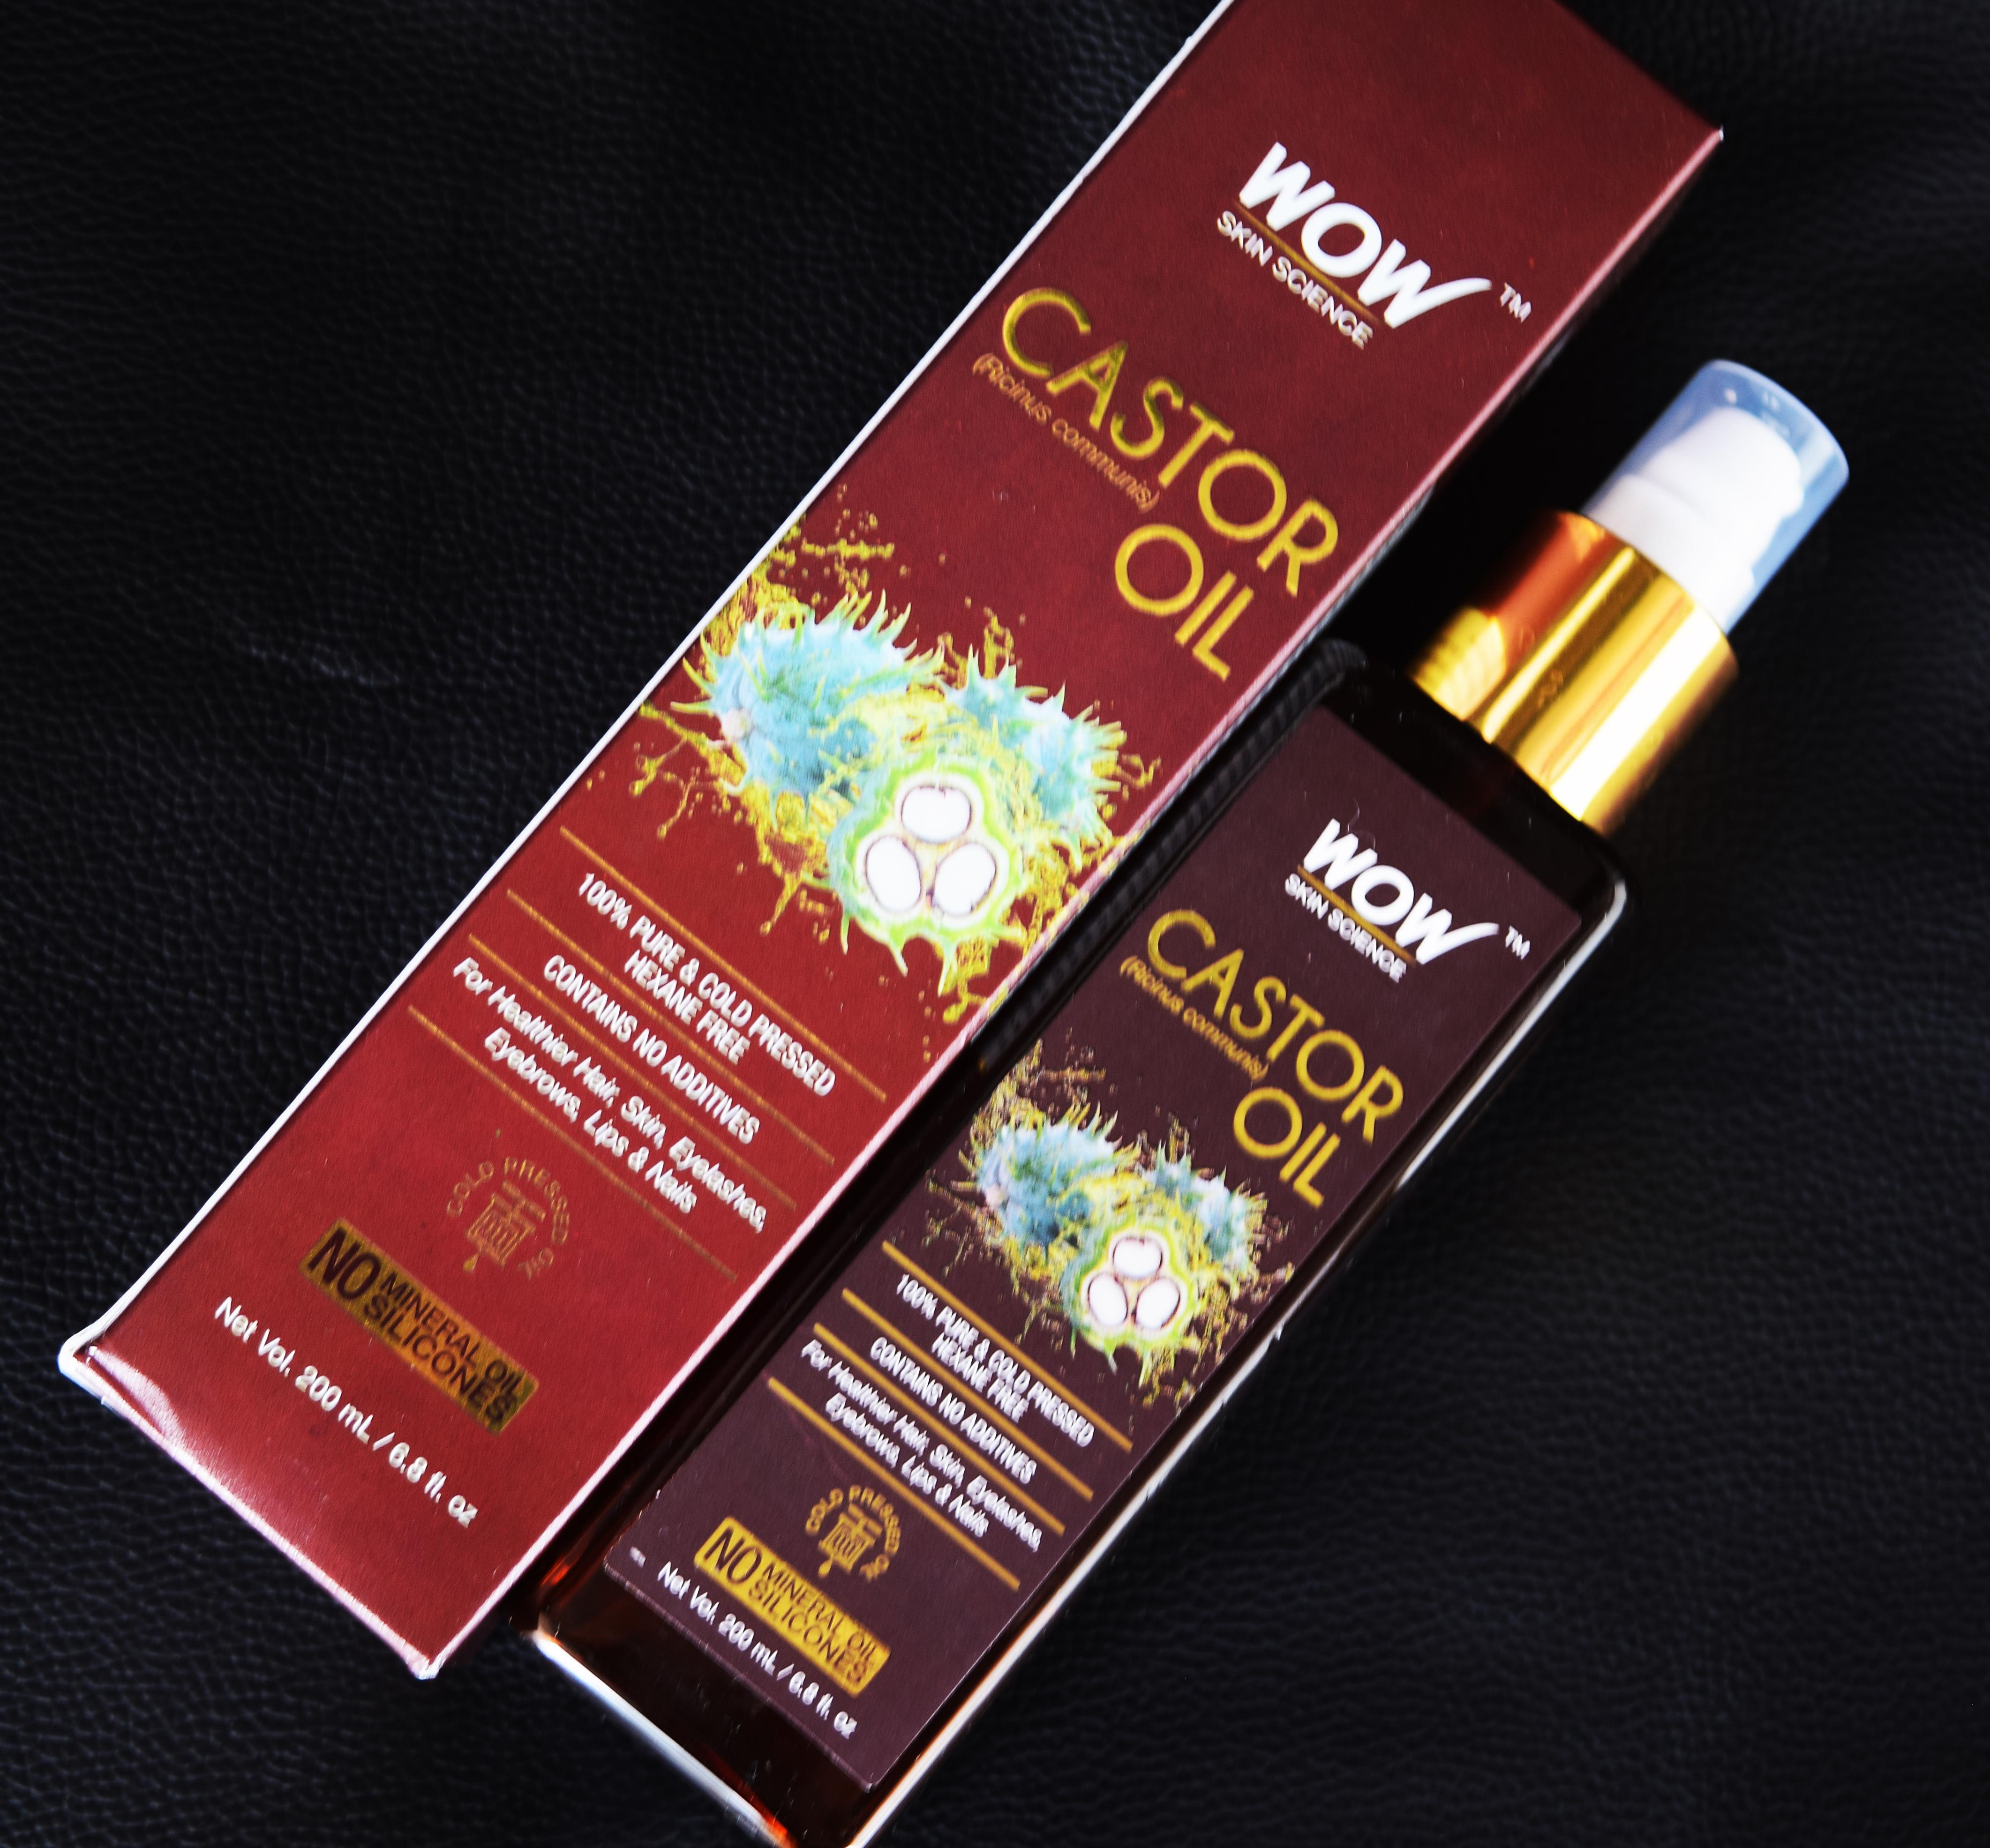 WOW Skin Science Castor Oil-Purest castor oil-By megha_saraf-3